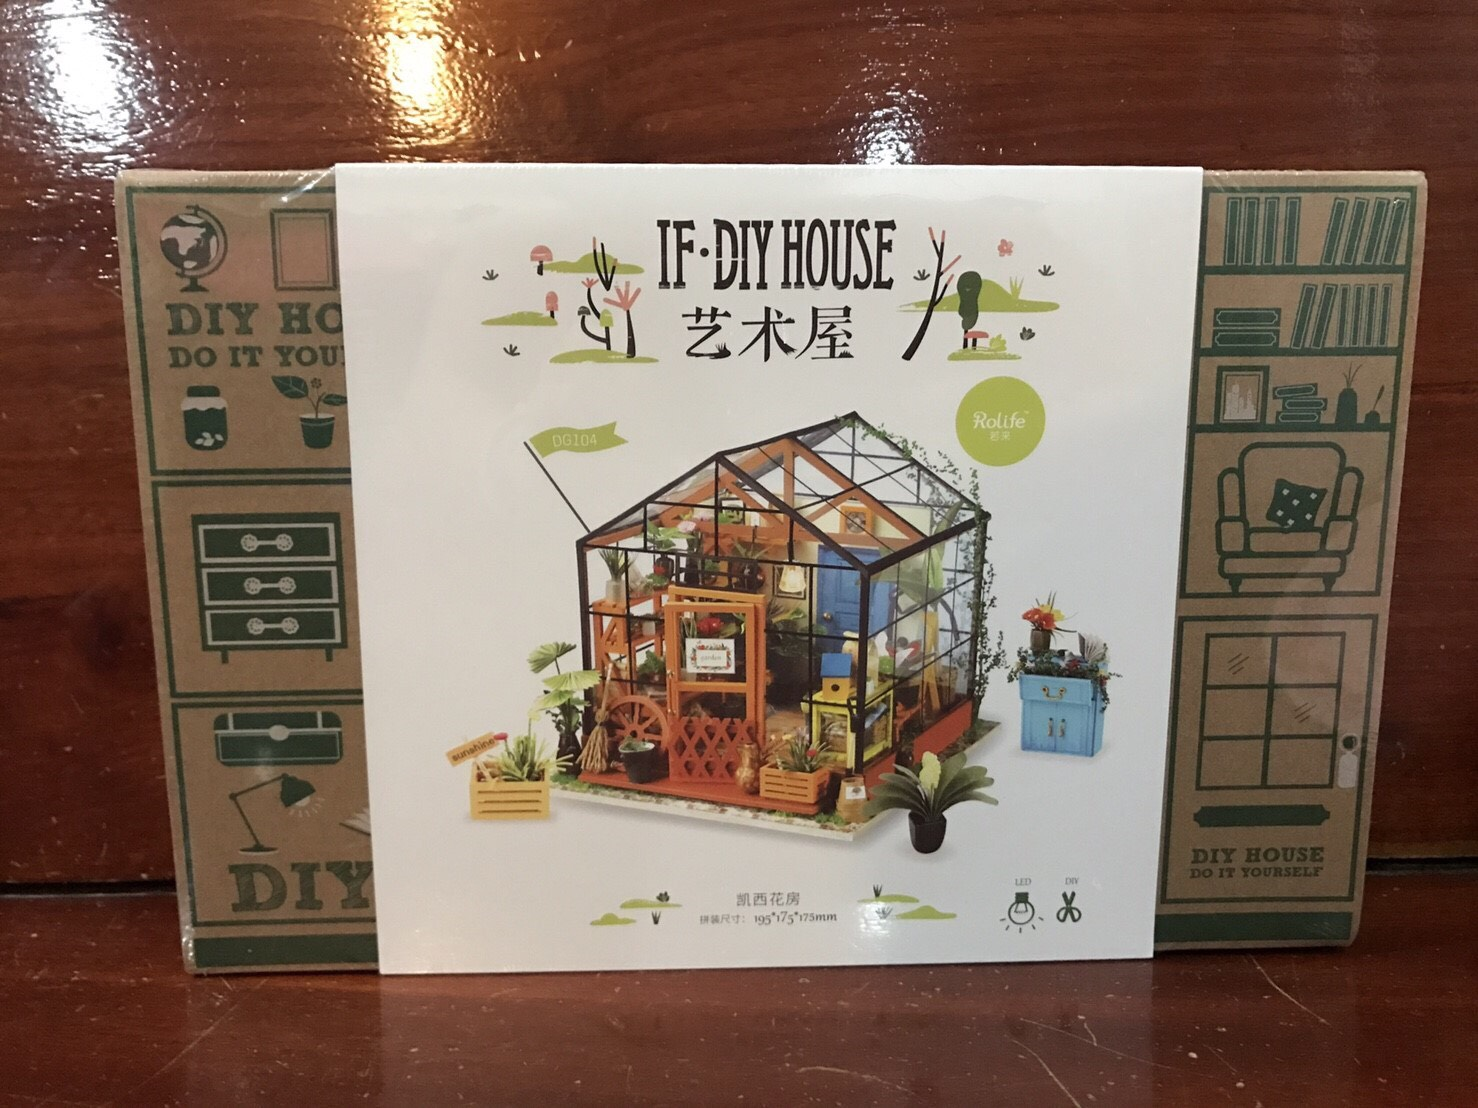 DIY House (DG104) - เรือนกระจก